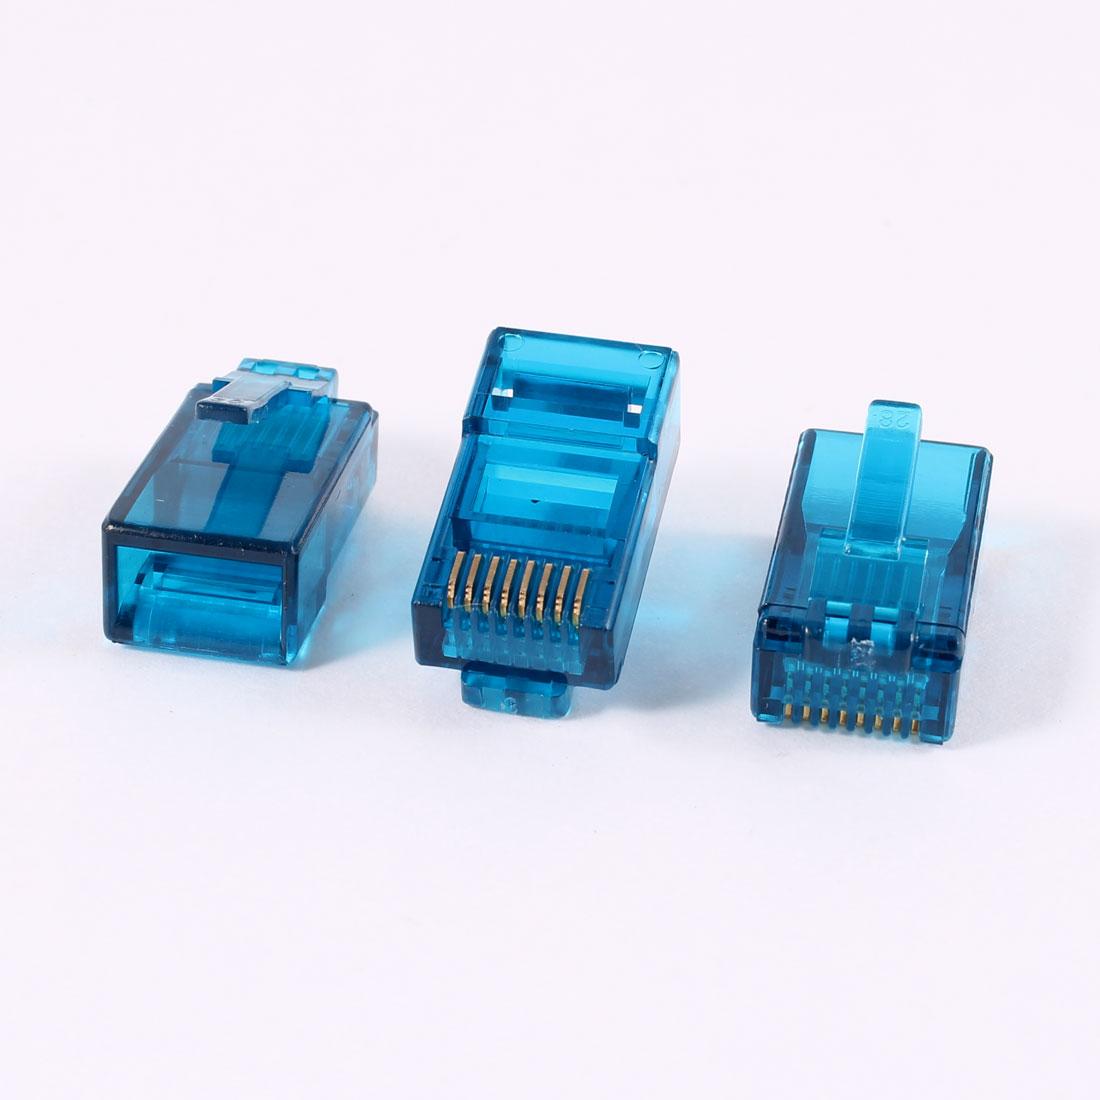 3 Pcs Teal Blue Plastic Shell RJ45 8P8C Modular Jack End Network Connector